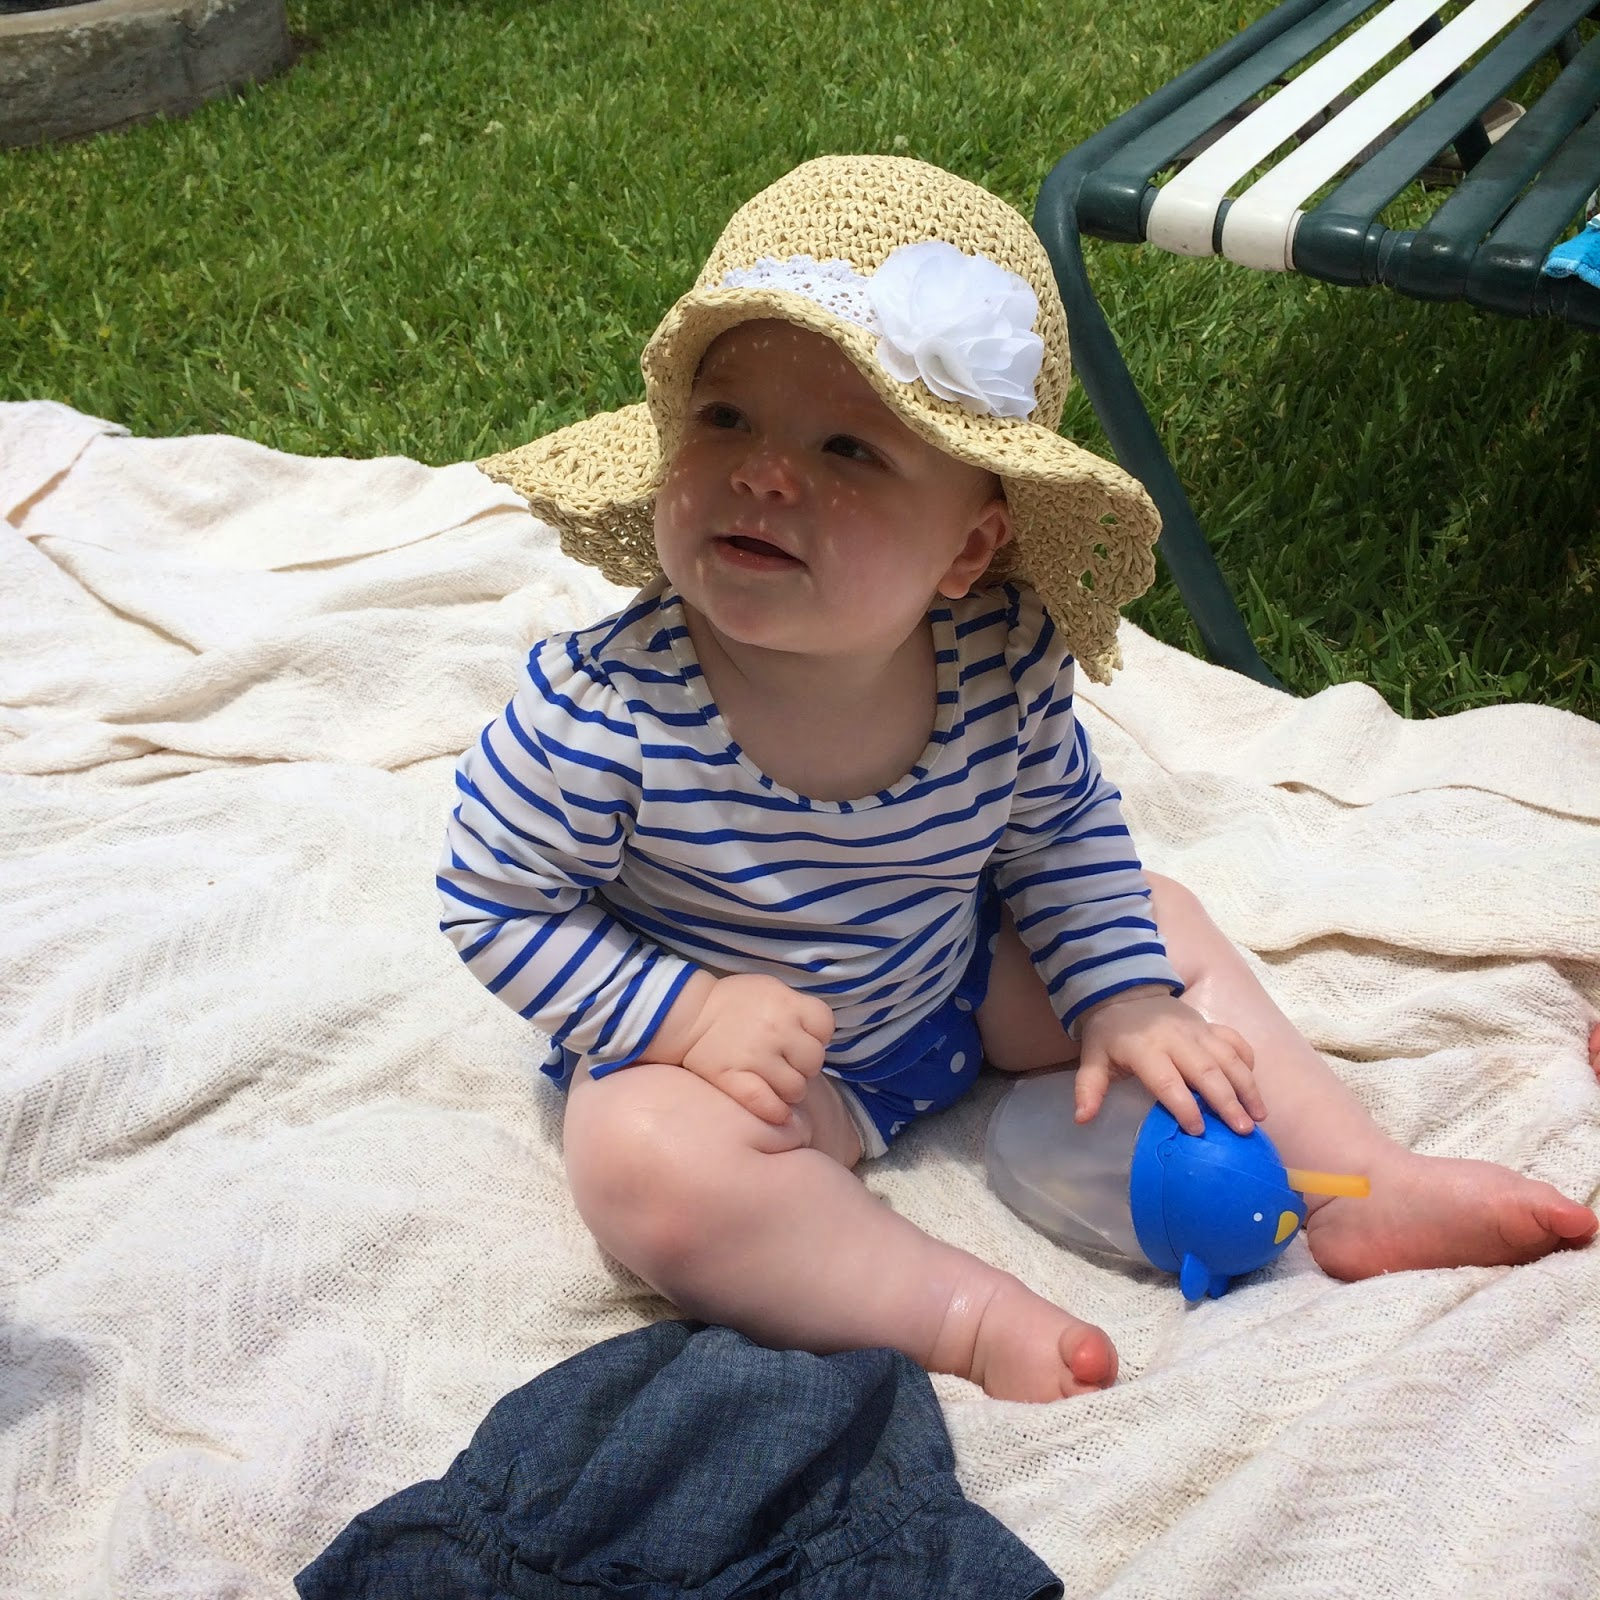 Veronika S Blushing Harper S Nursery Updated: We Had Such A Wonderful Weekend